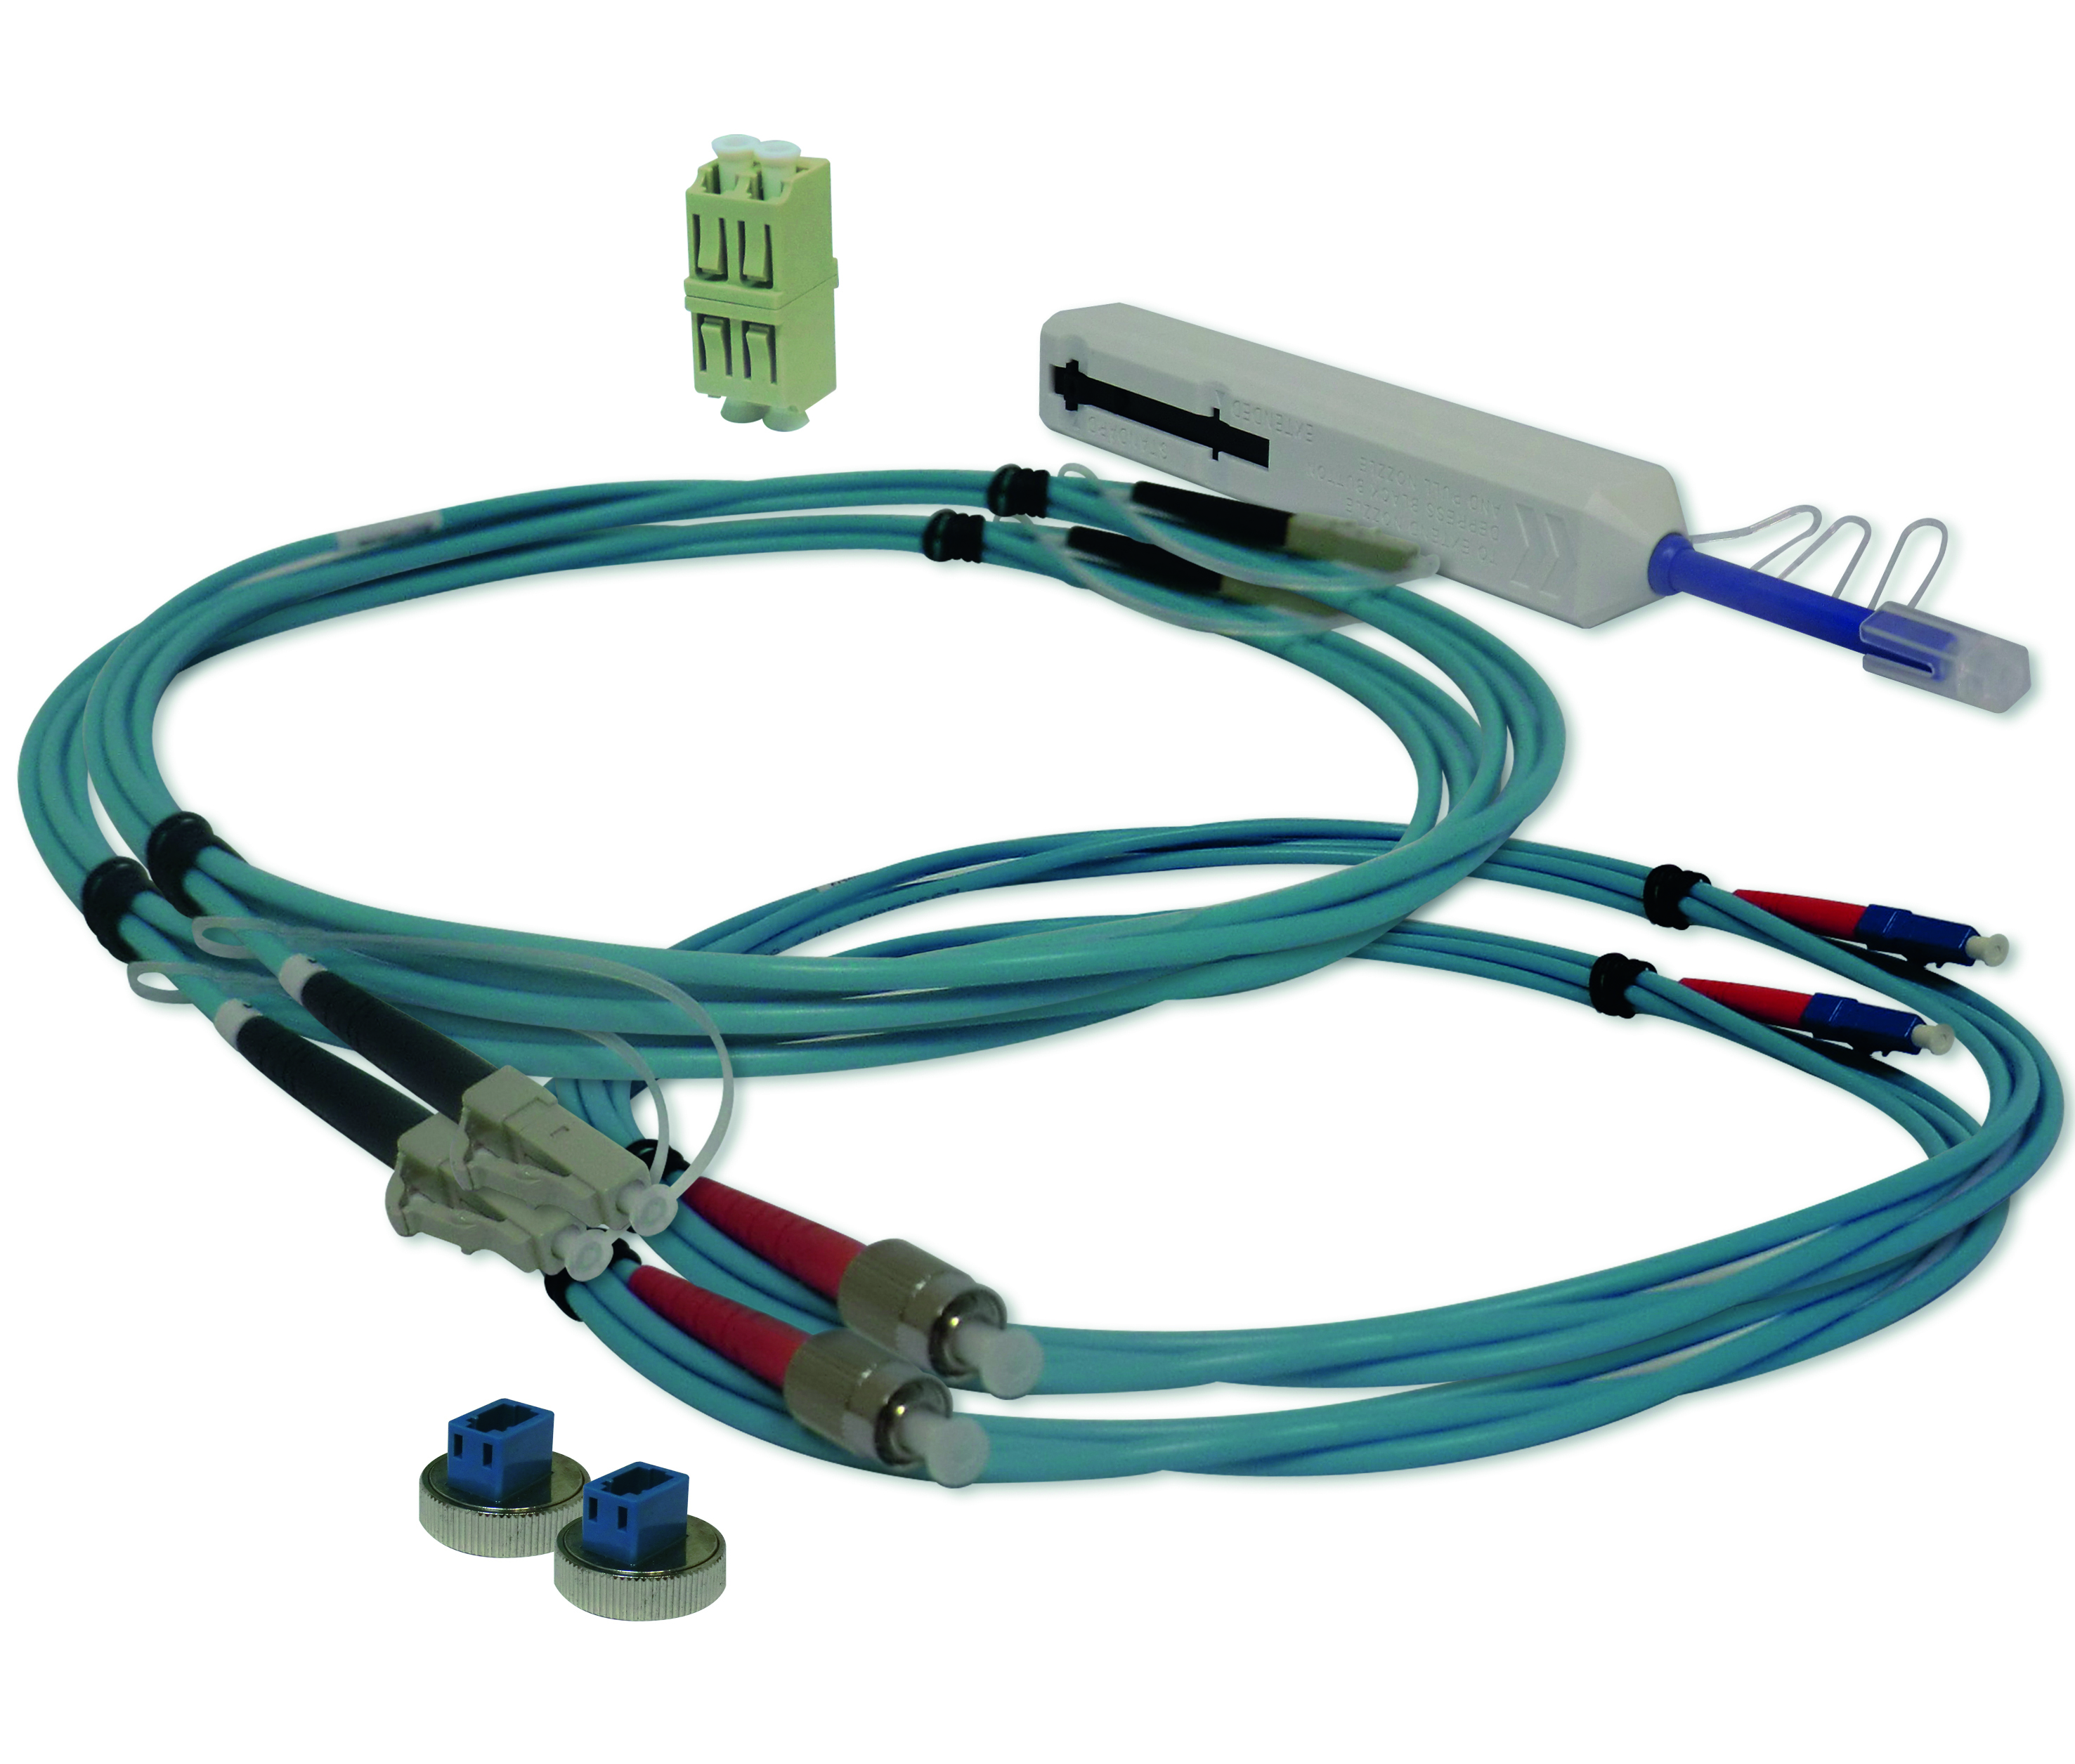 1 Stk WireXpert - LC Test-Kabel Kit, Multimode HMSWXZFMTC